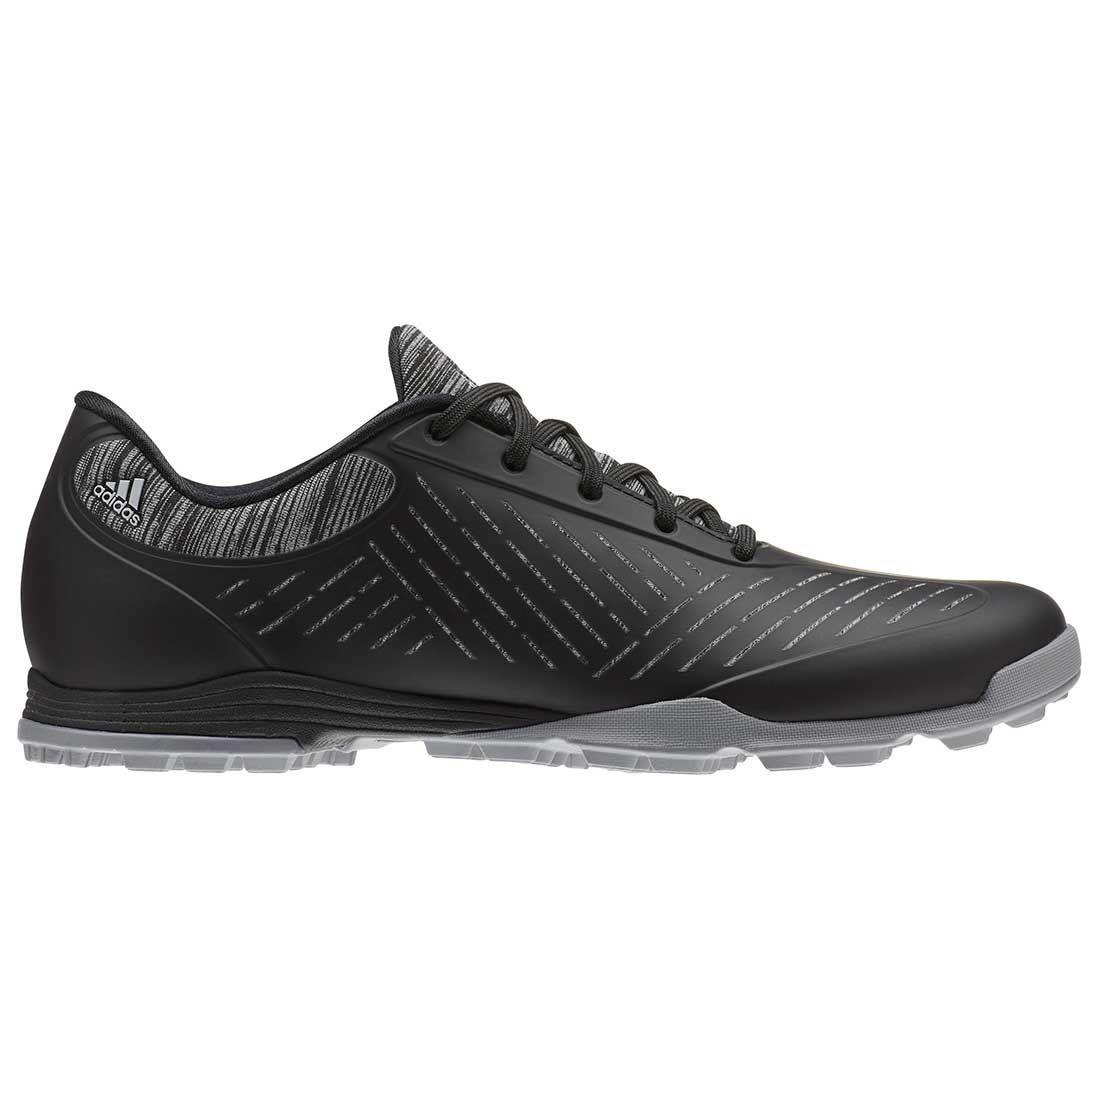 AdiPure Sport 2.0 Golf Shoes Black